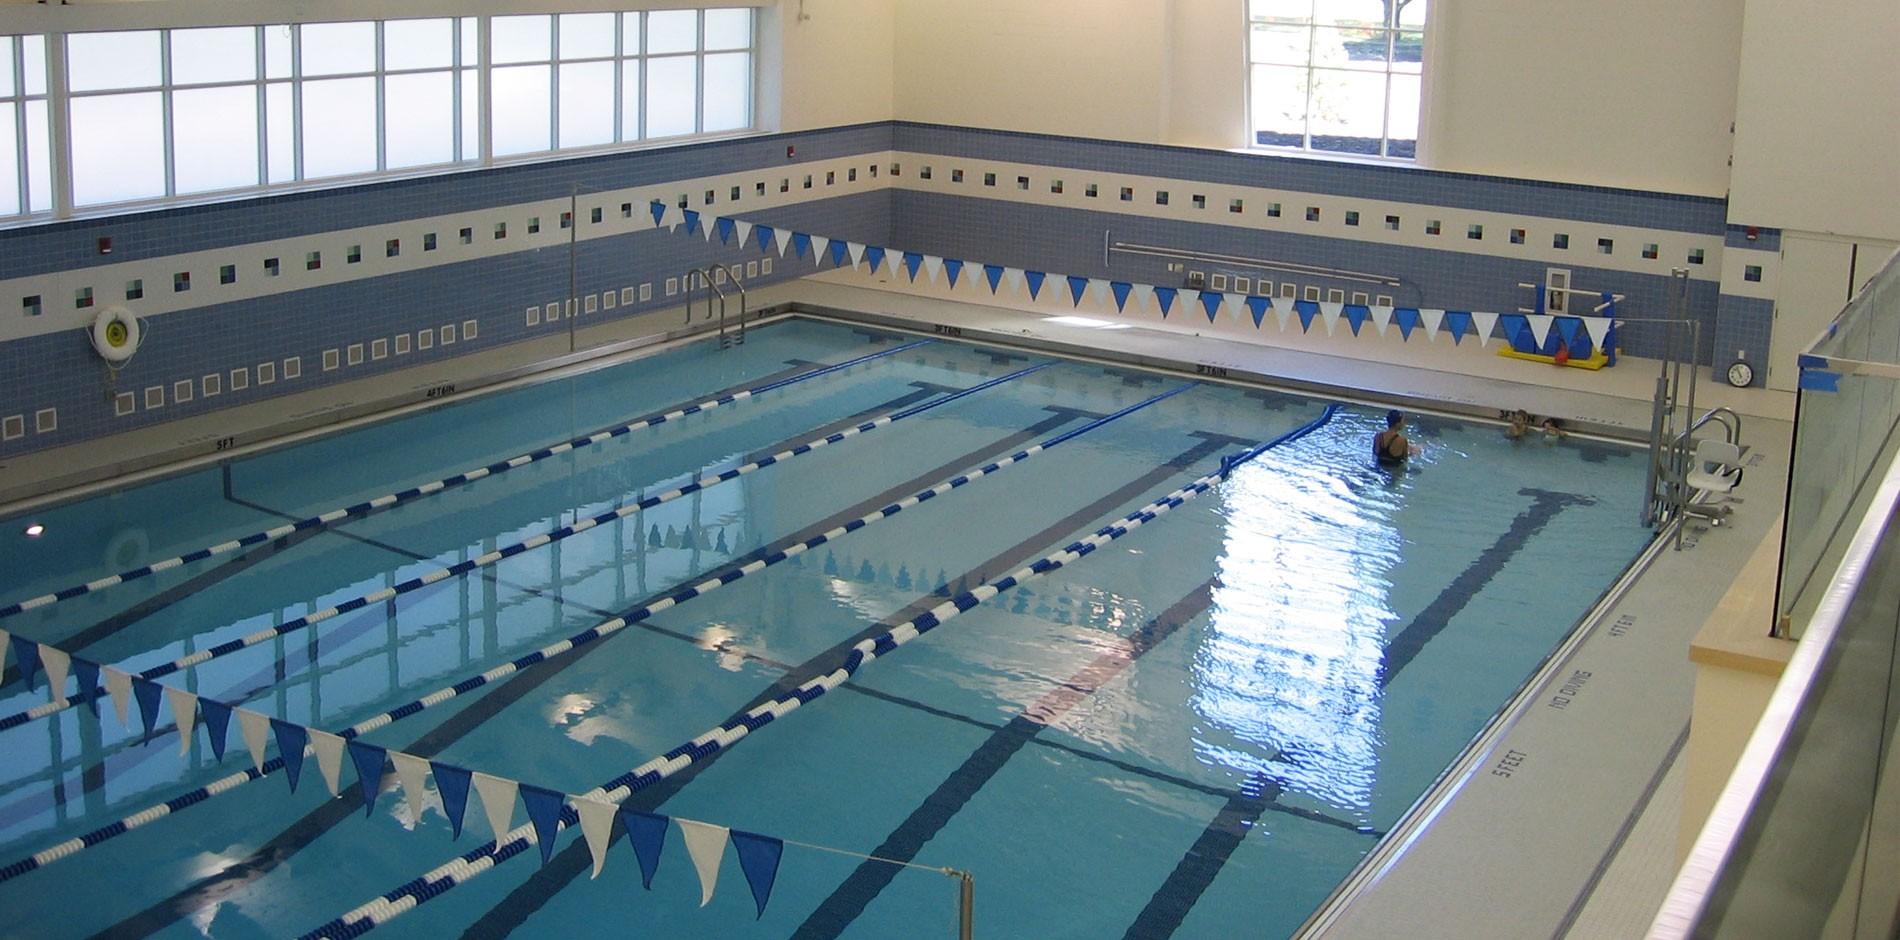 Bingley Pool has extra swim lessons while Shipley Pool closed